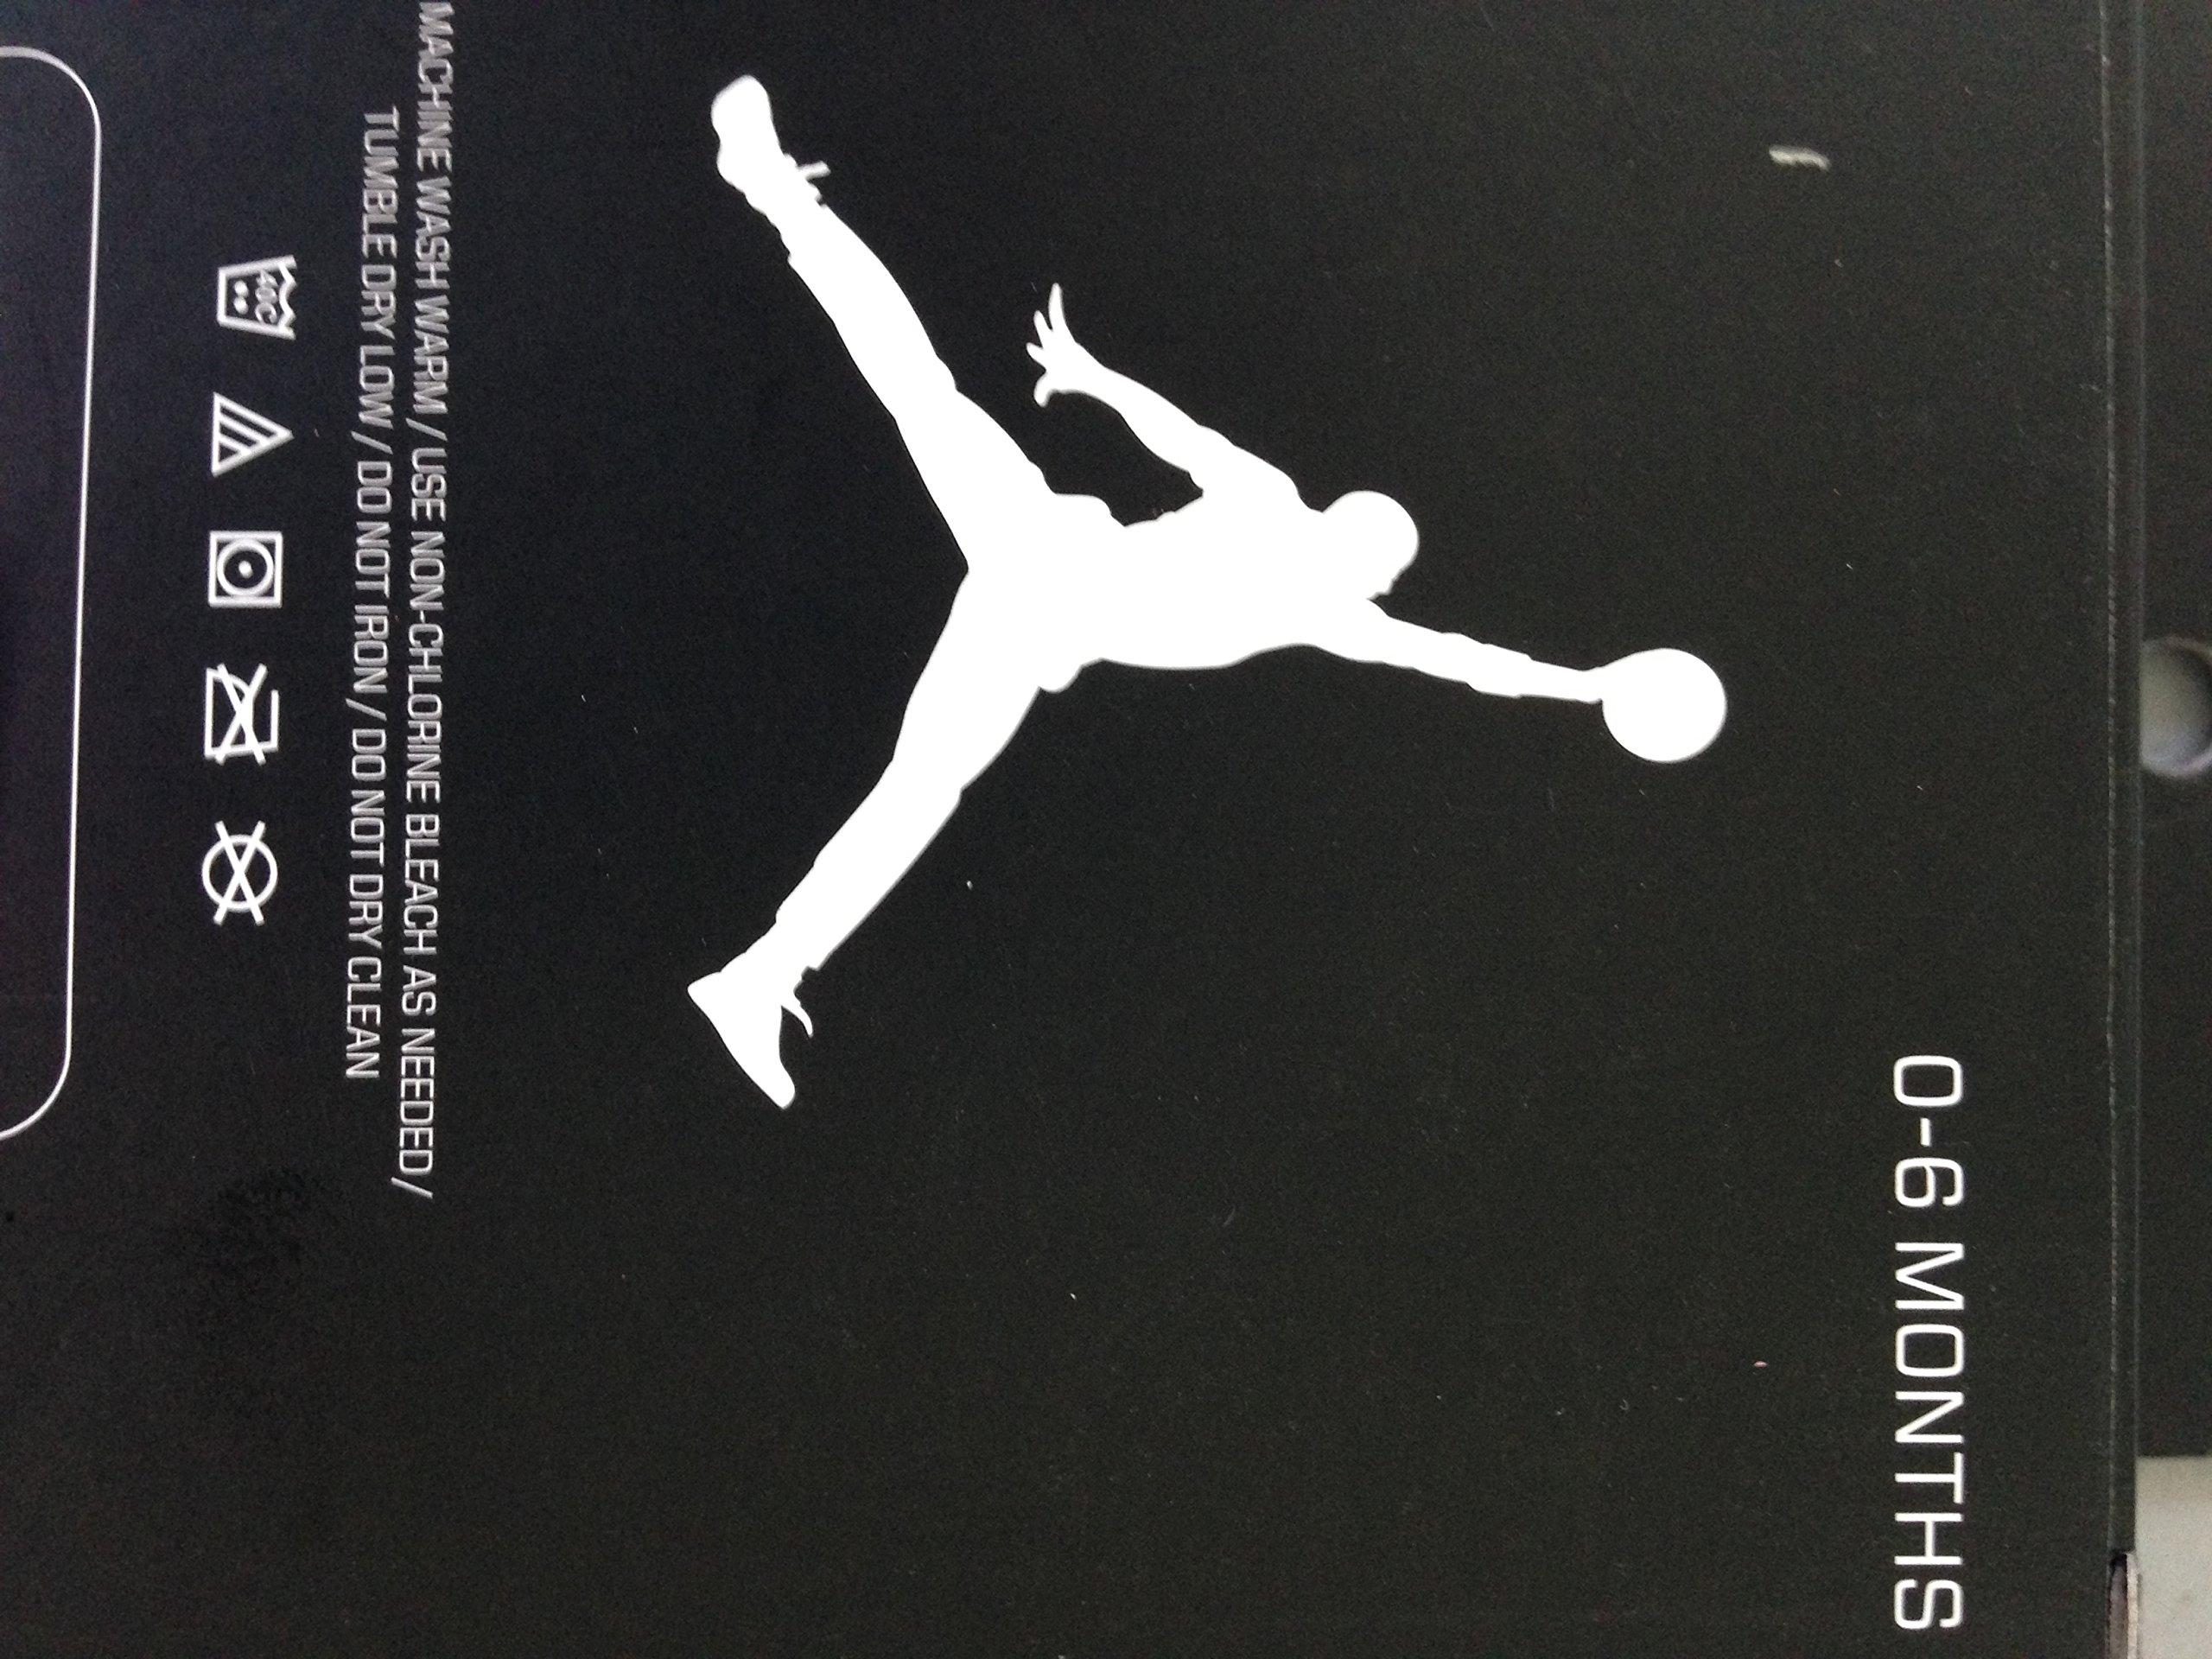 New Nike Jordan Jumpman 23 Baby Booties, Blue White, 0-6 Month, 2 Pair.